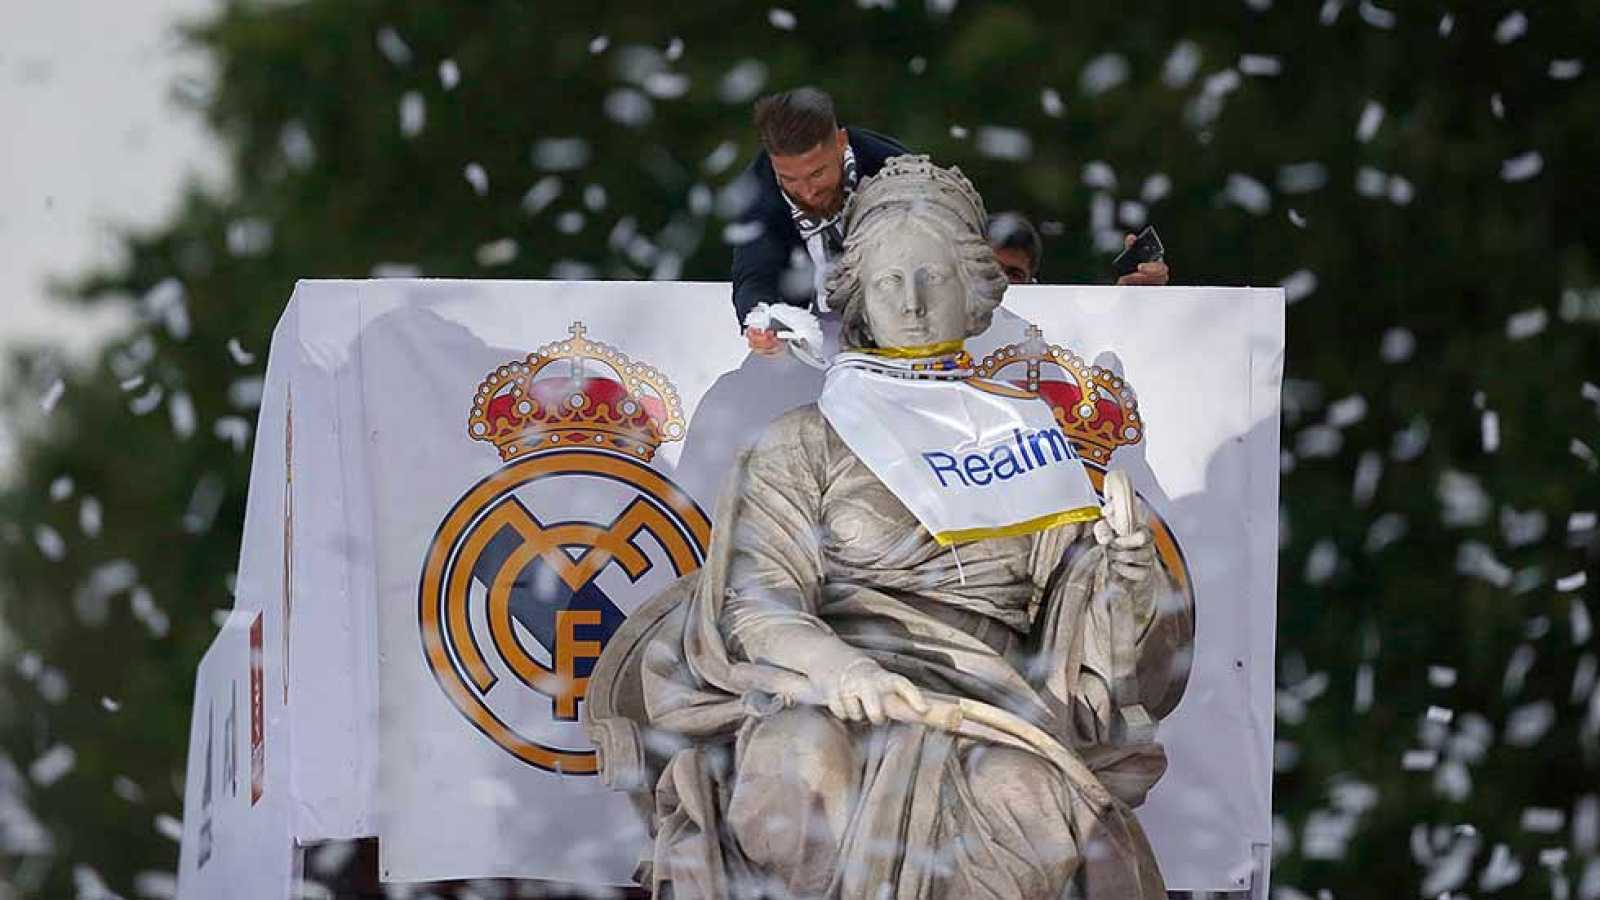 Final Champions | Madrid vs Atlético | El Real Madrid brinda la ...